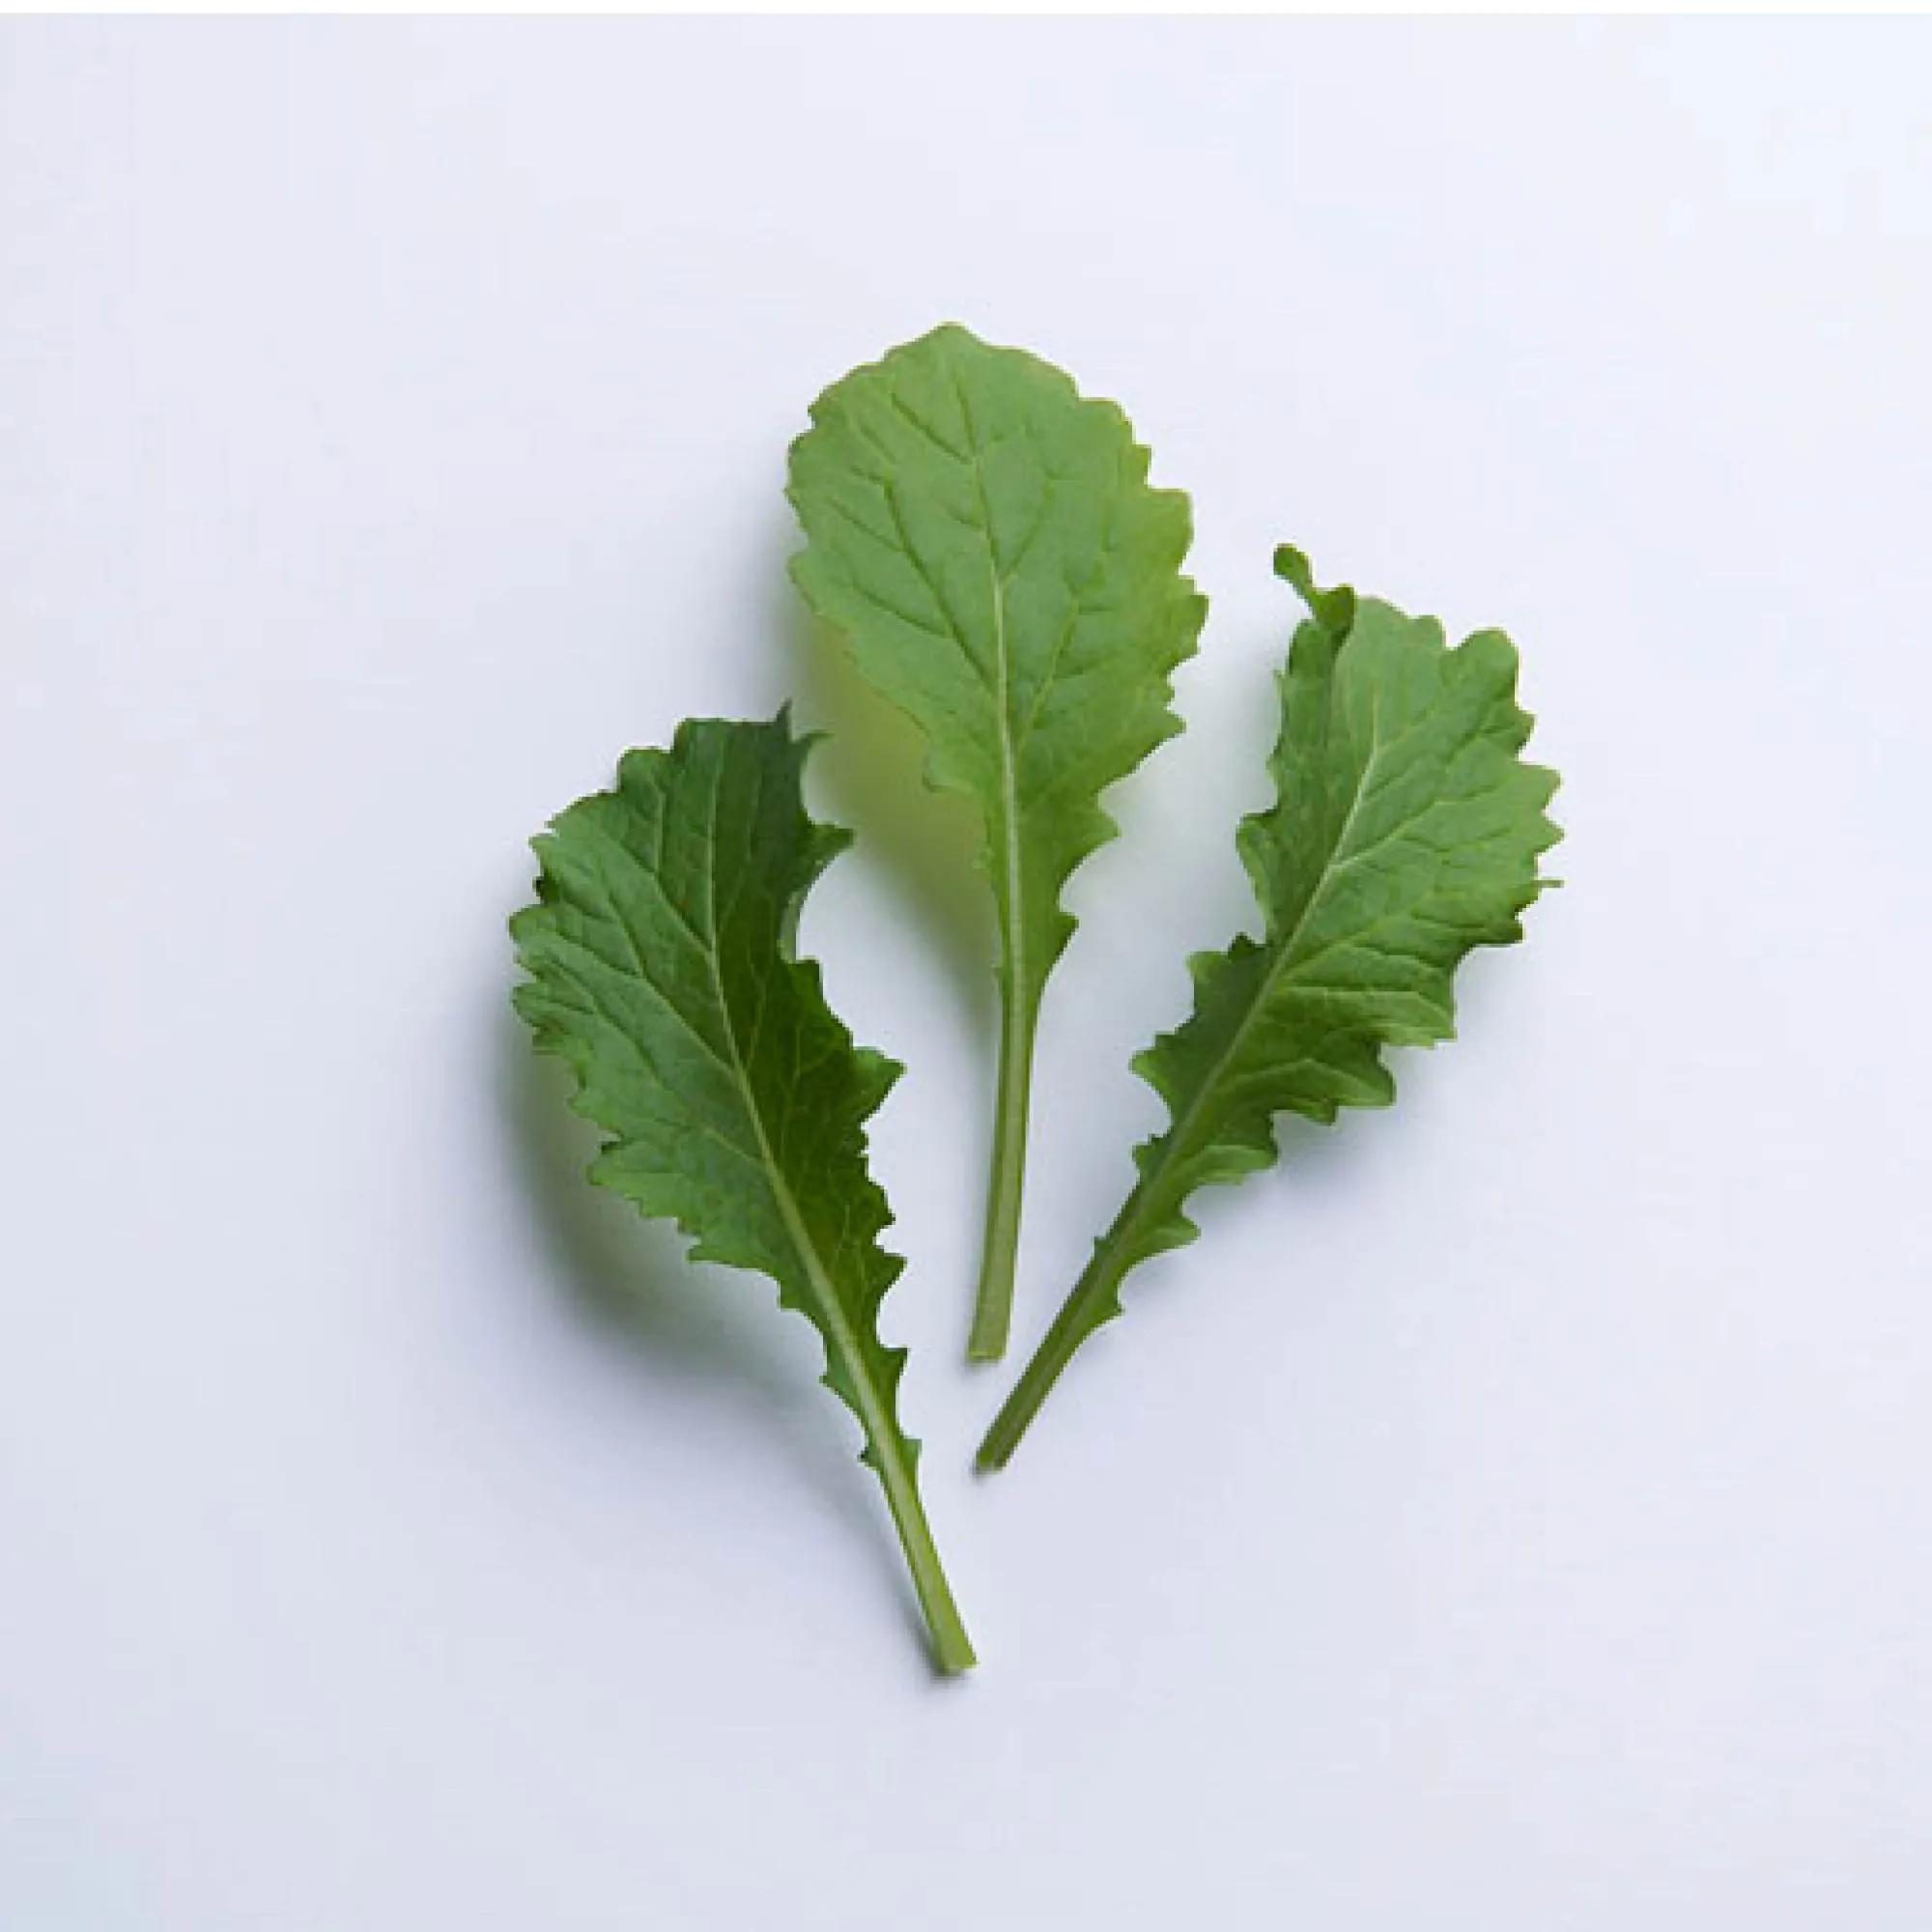 Sementes para plantar Mostarda  Crespa Baby Leaf em vasos autoirrigáveis RAIZ  - Vasos Raiz Loja Oficial